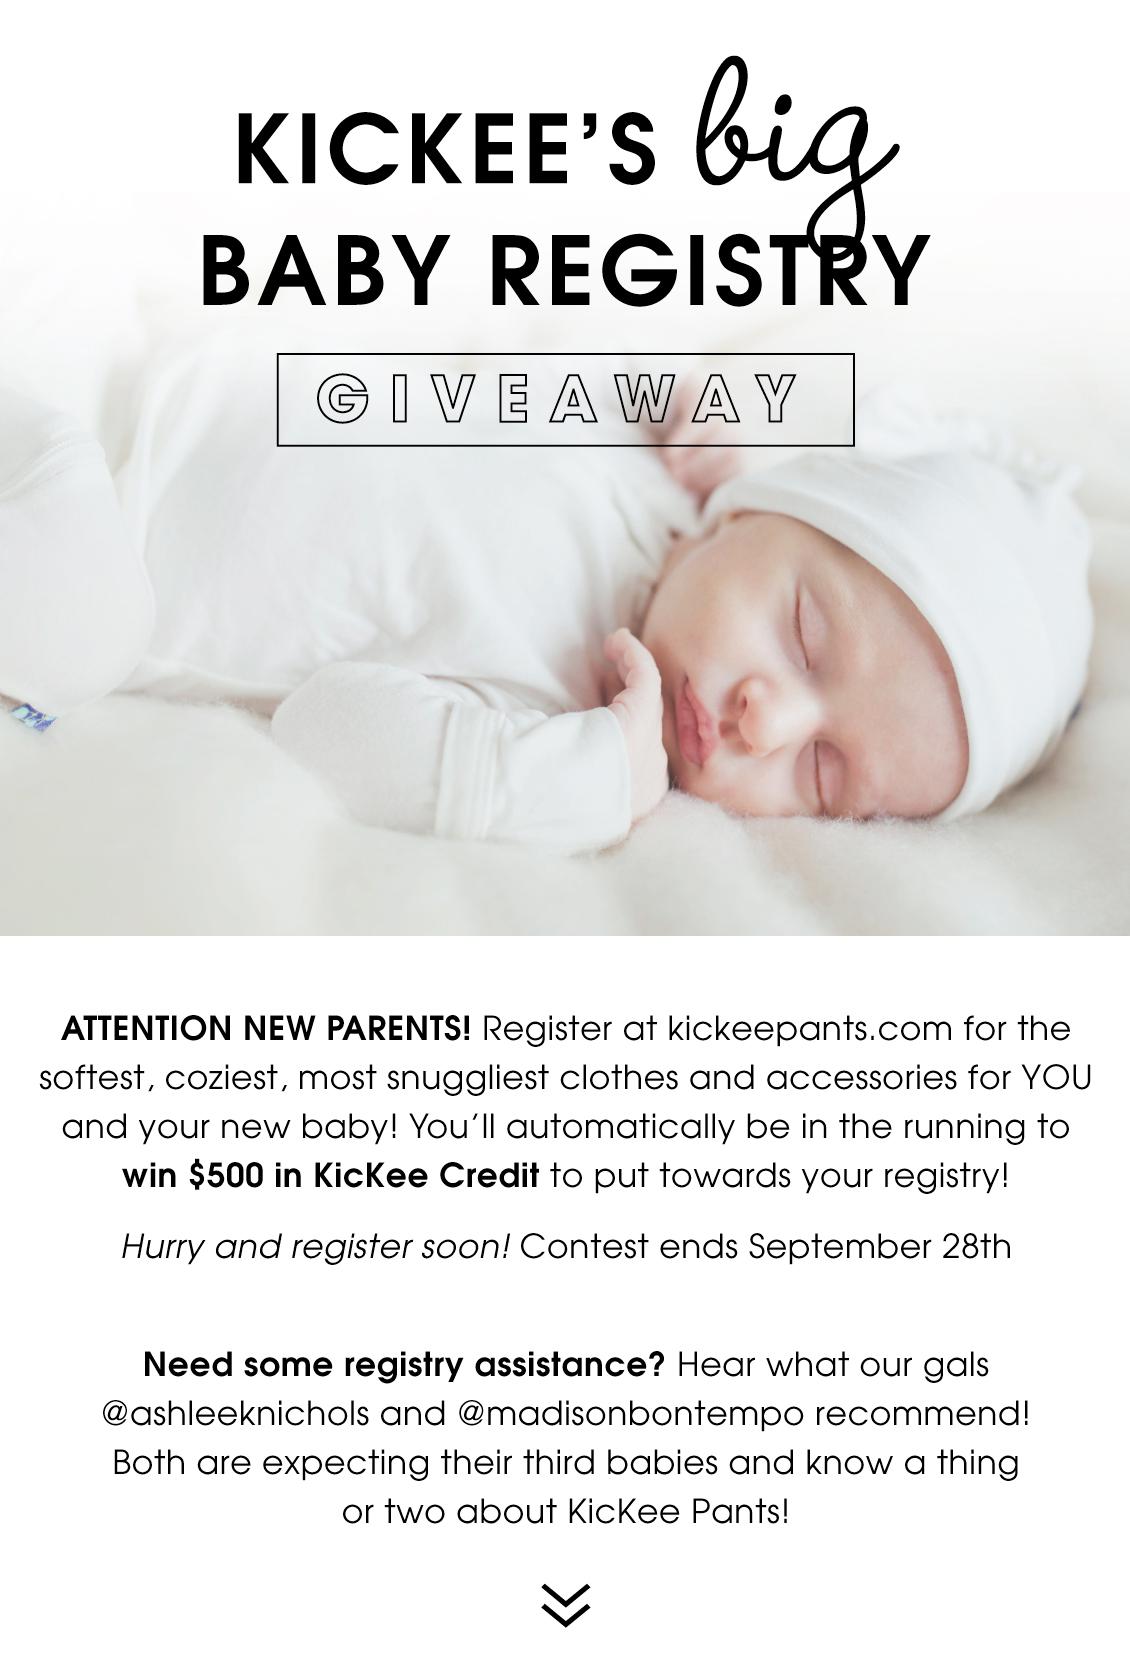 Baby-Registry-Giveaway-Campaign_Blog_01.jpg